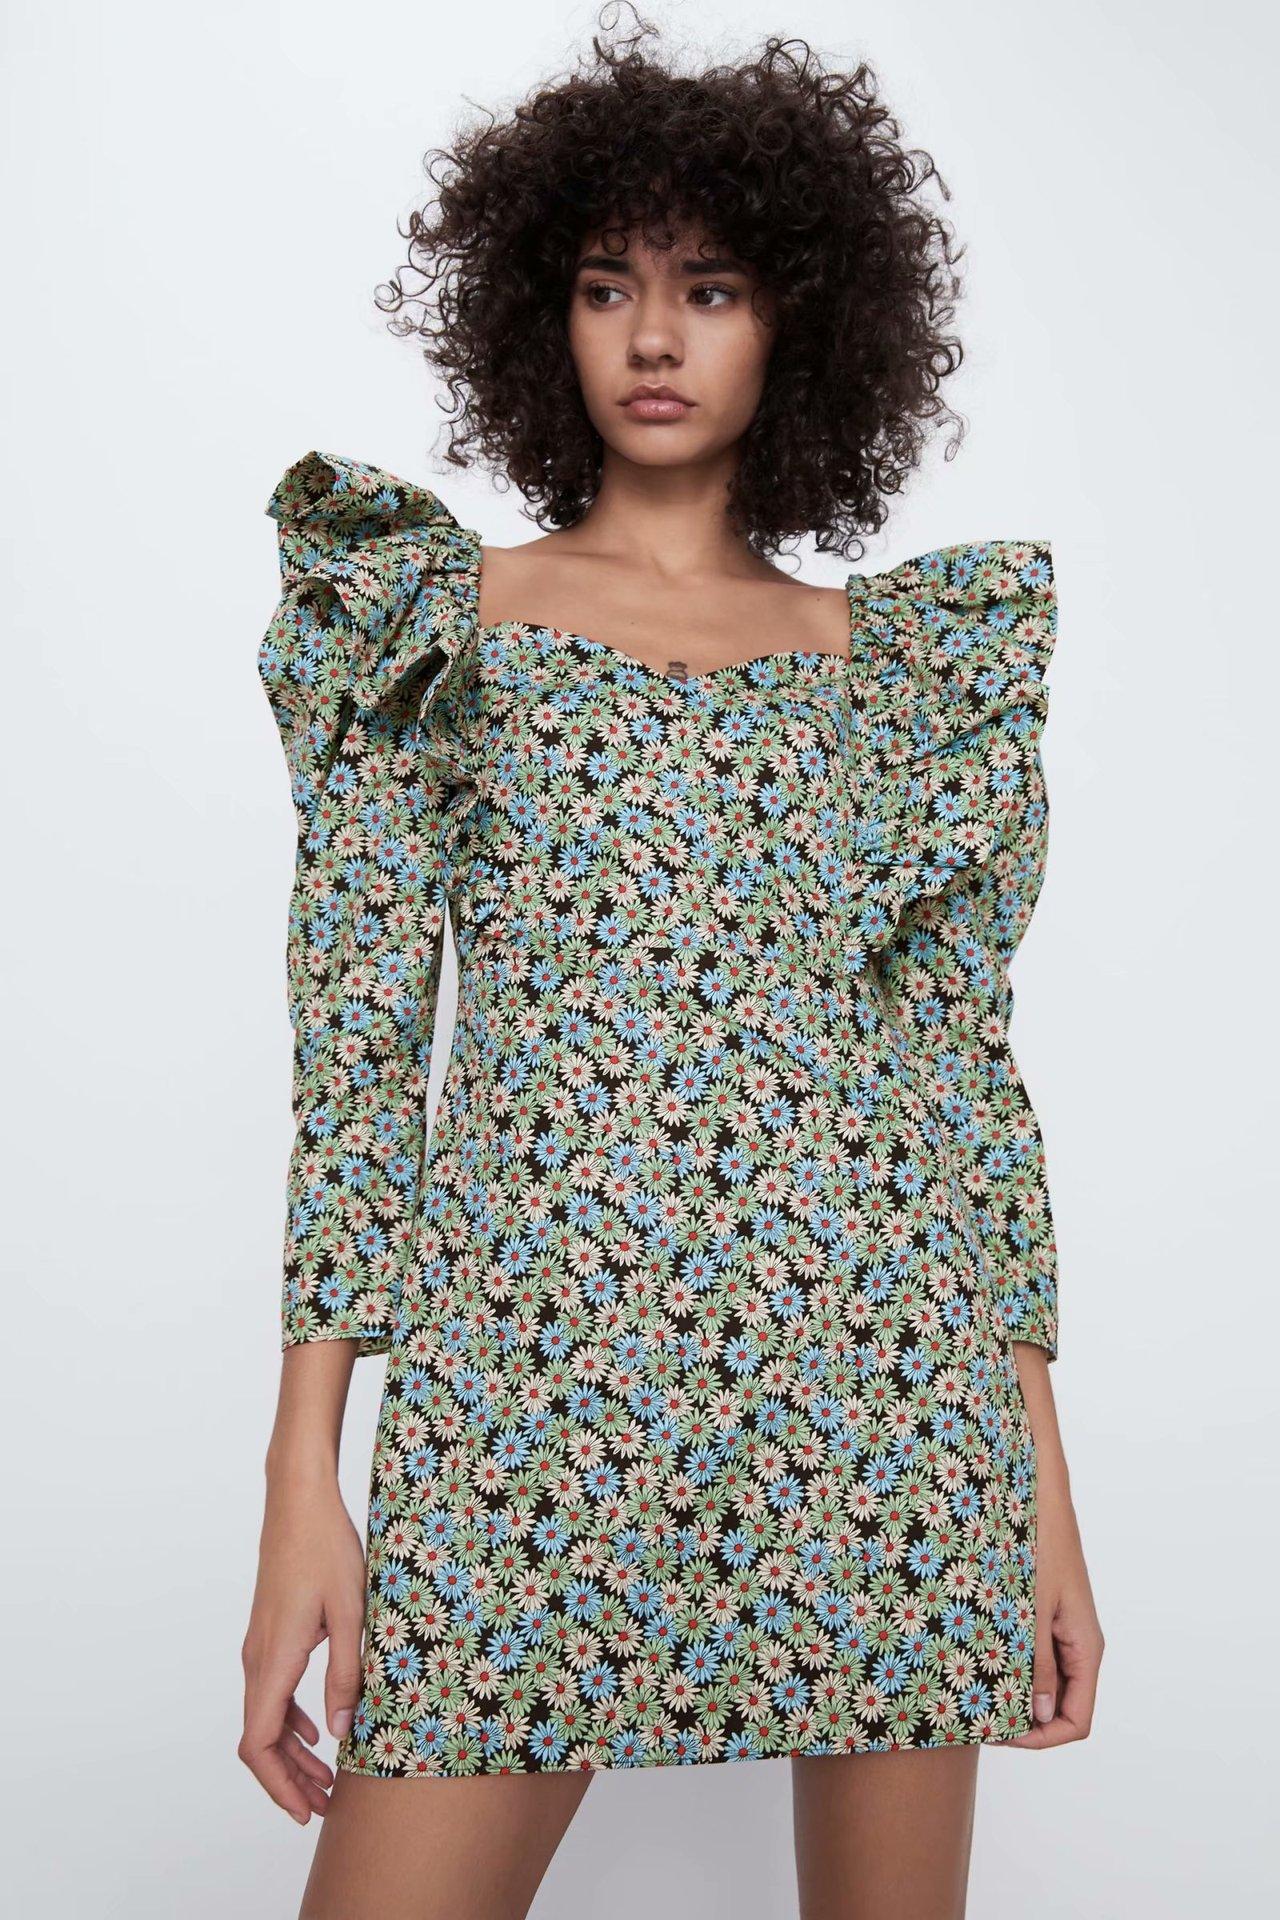 2020 New Spring And Summer New Style European Daisy Printed Poplin Dress Zaraing Vadiming Sheining Female Address